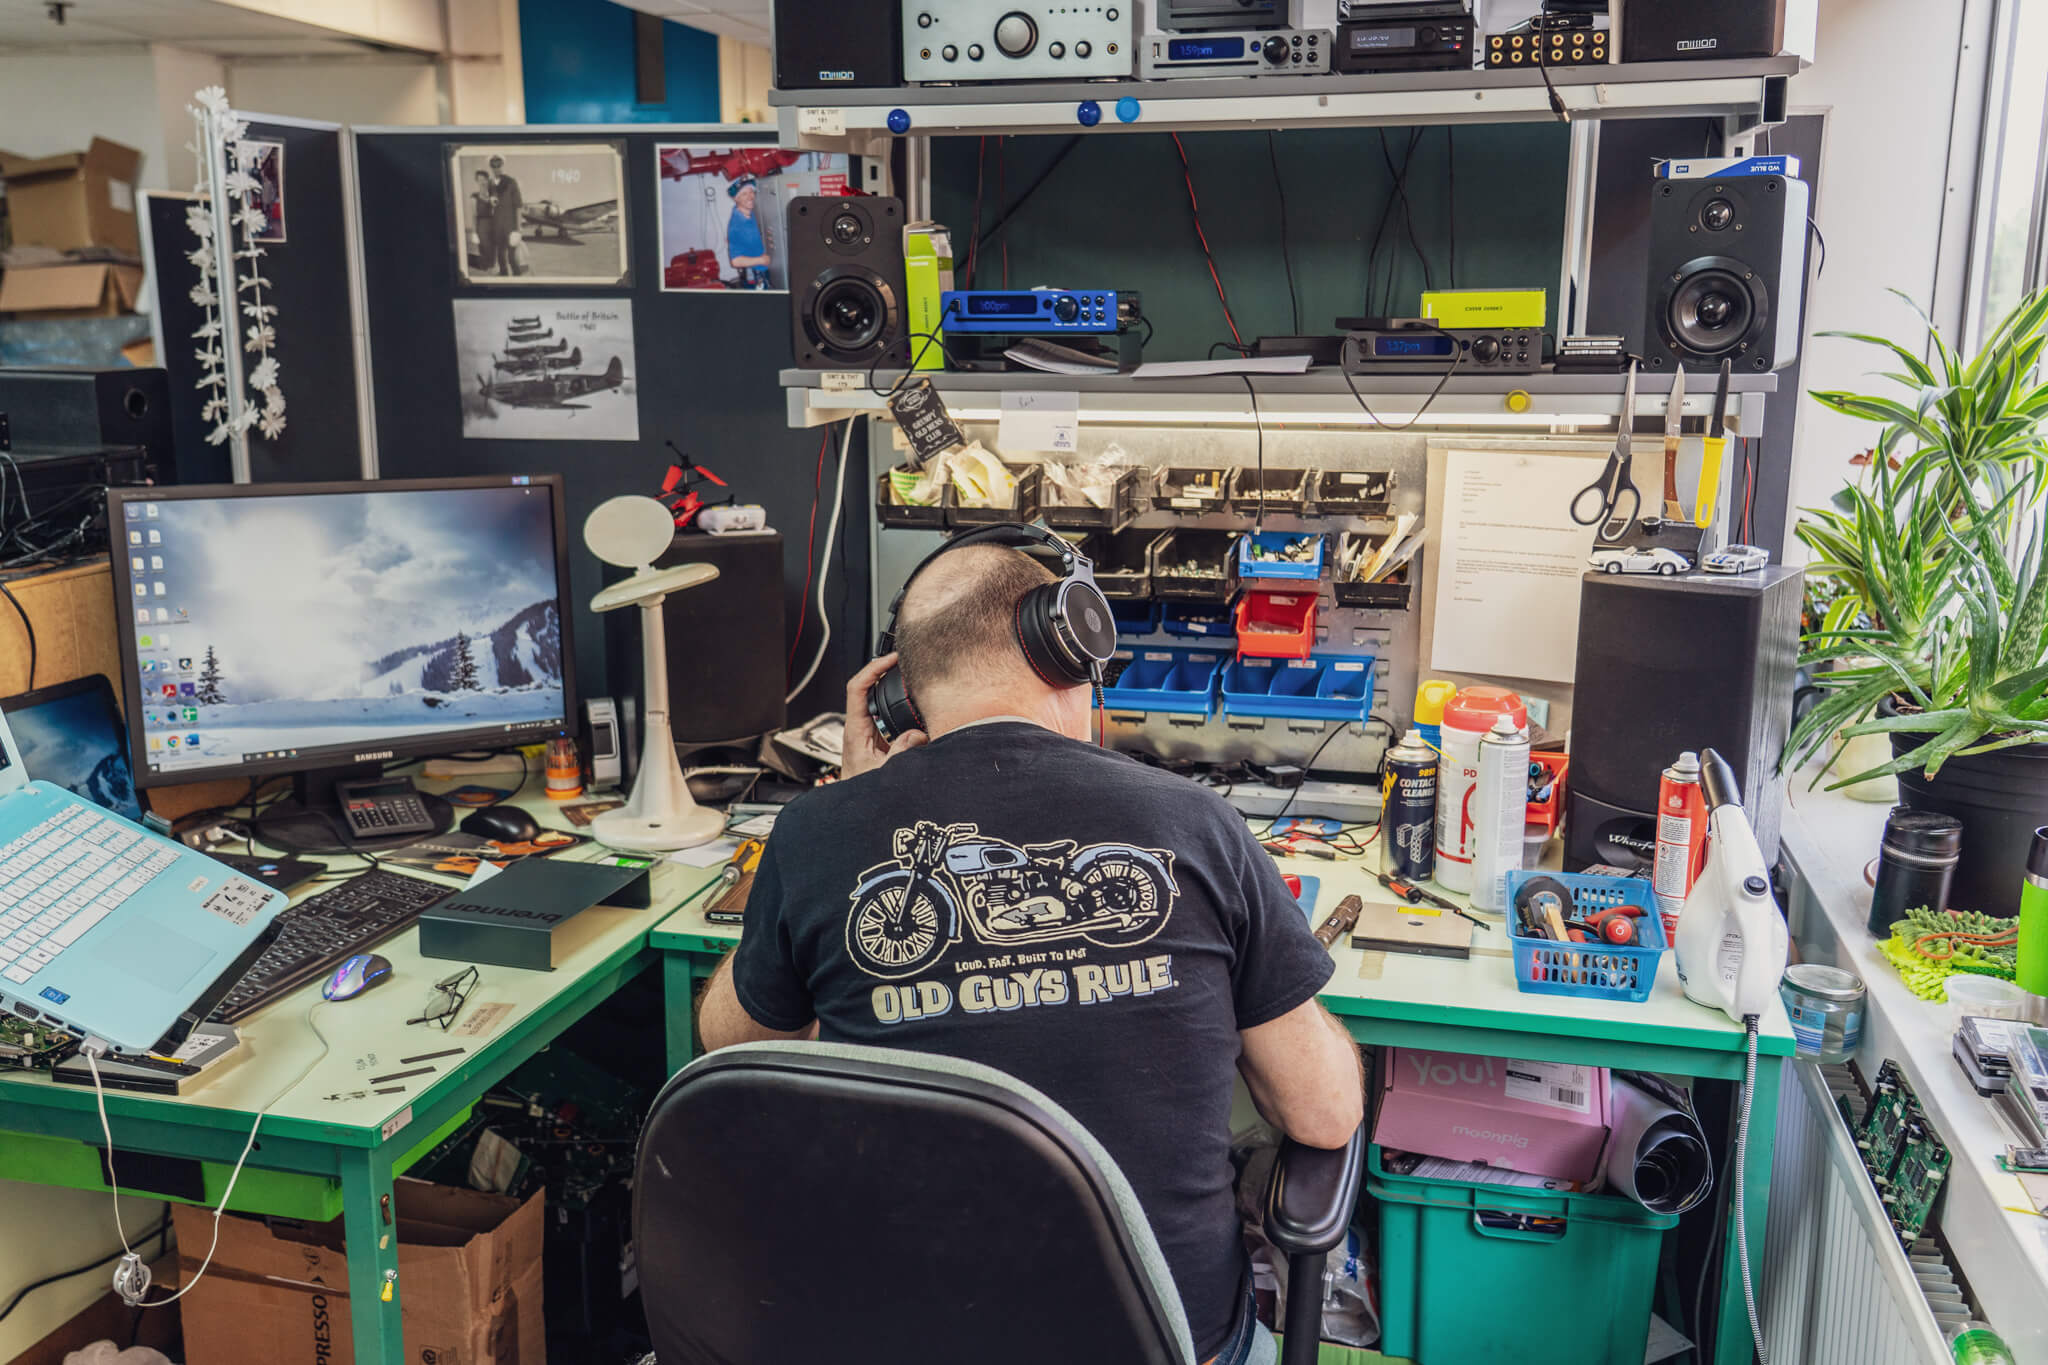 Old Guys Rule - Jon hard at work repairing audio devices